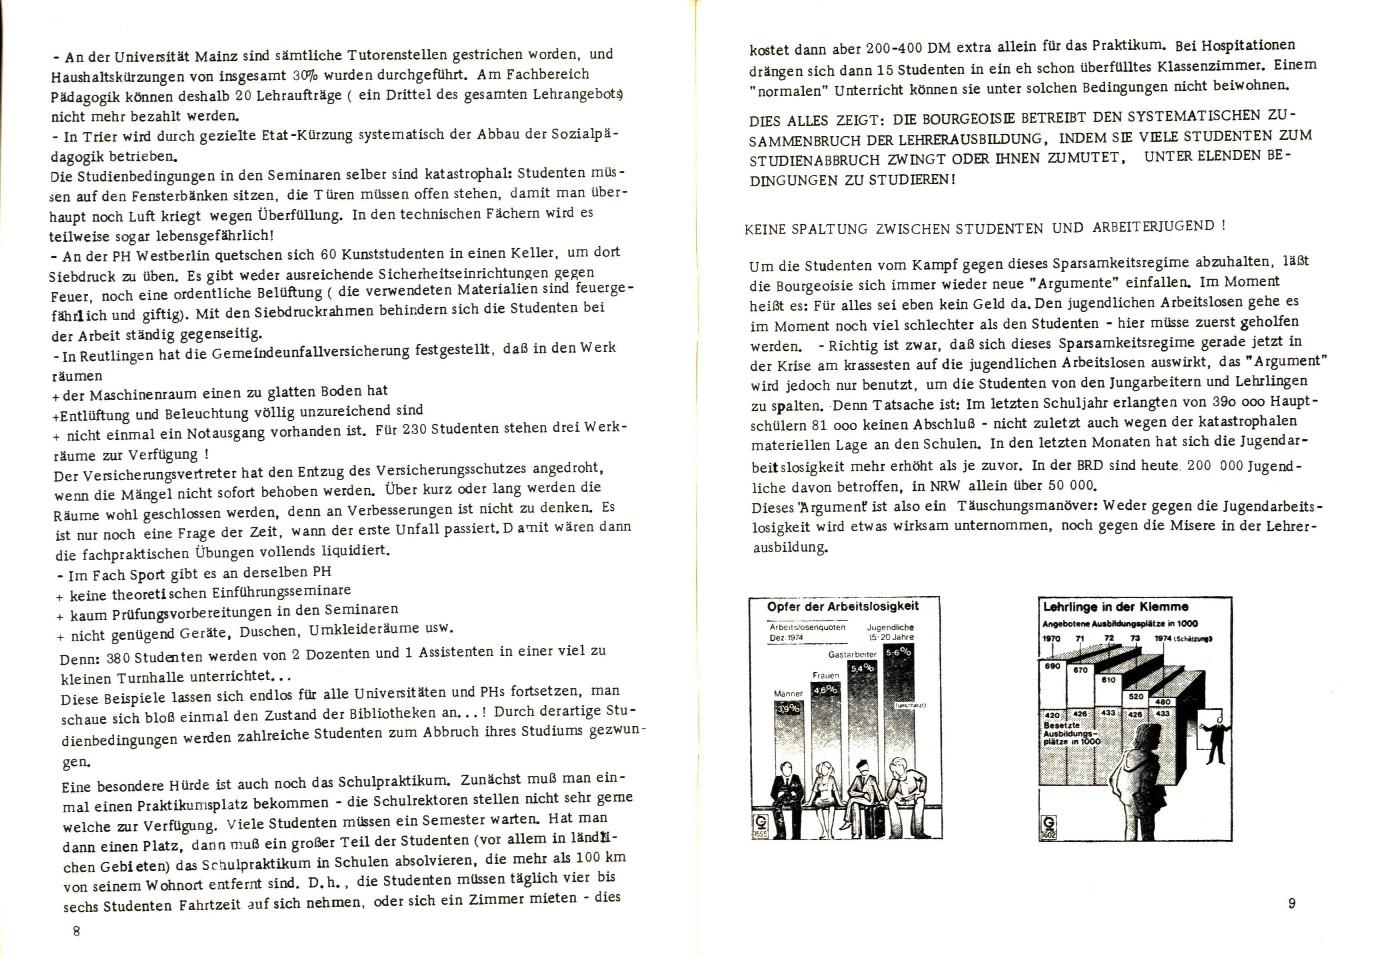 KSV_1975_Lehrerausbildung_05